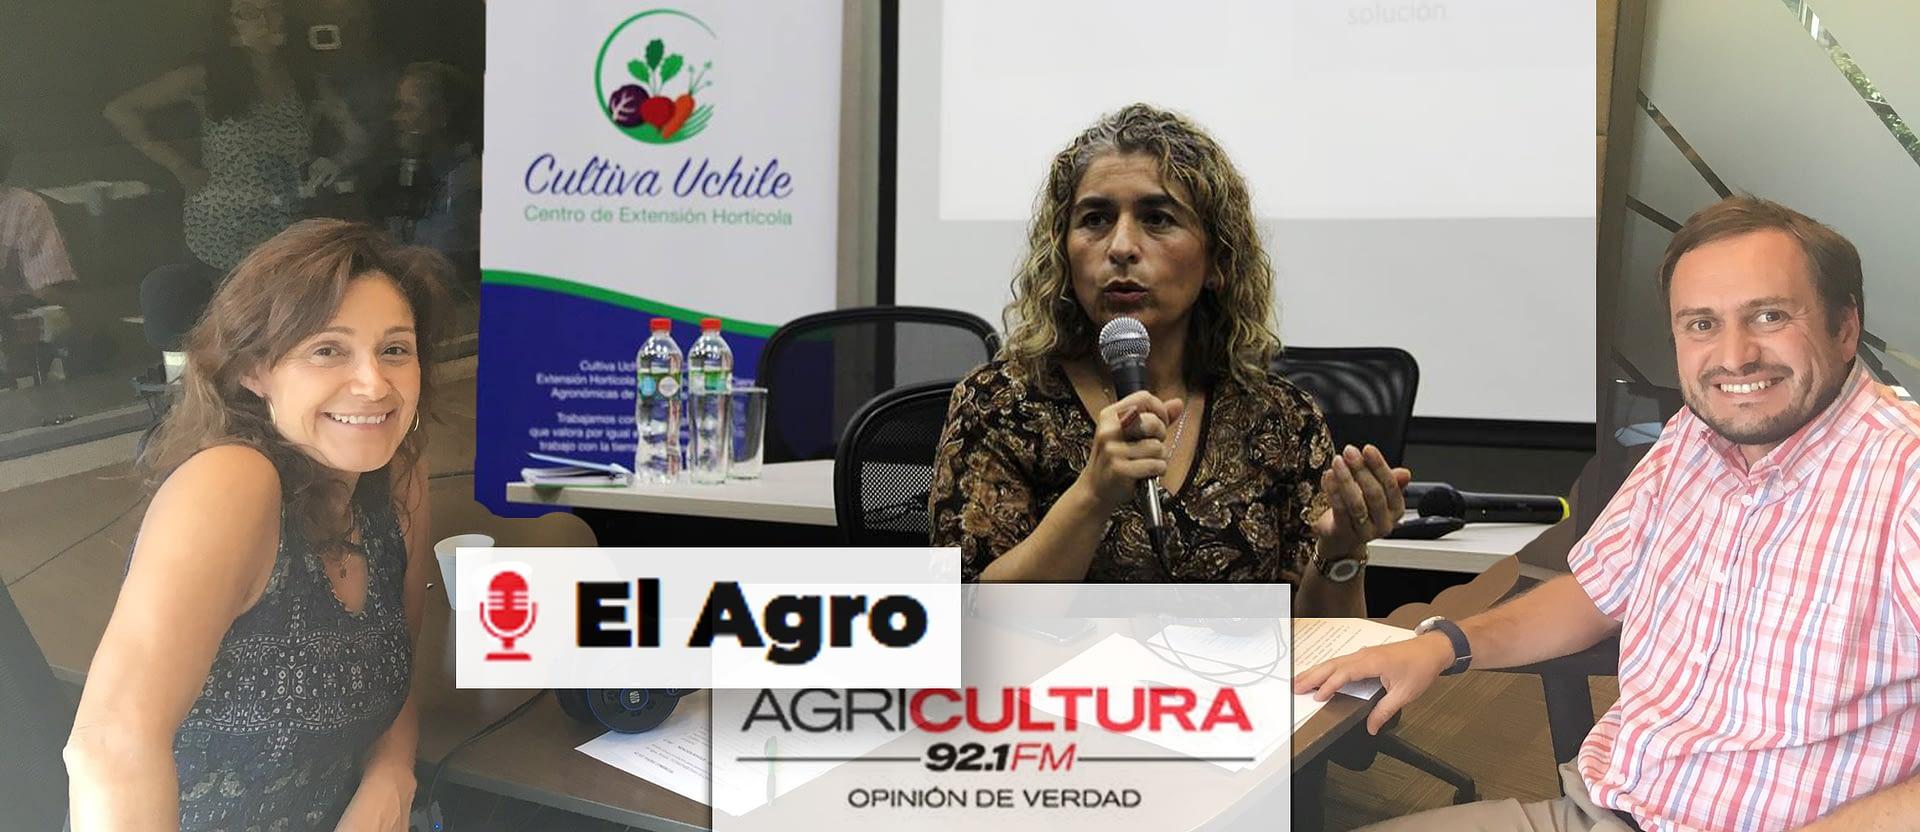 Entrevista a Directora de Cultiva UChile en Radio Agricultura.